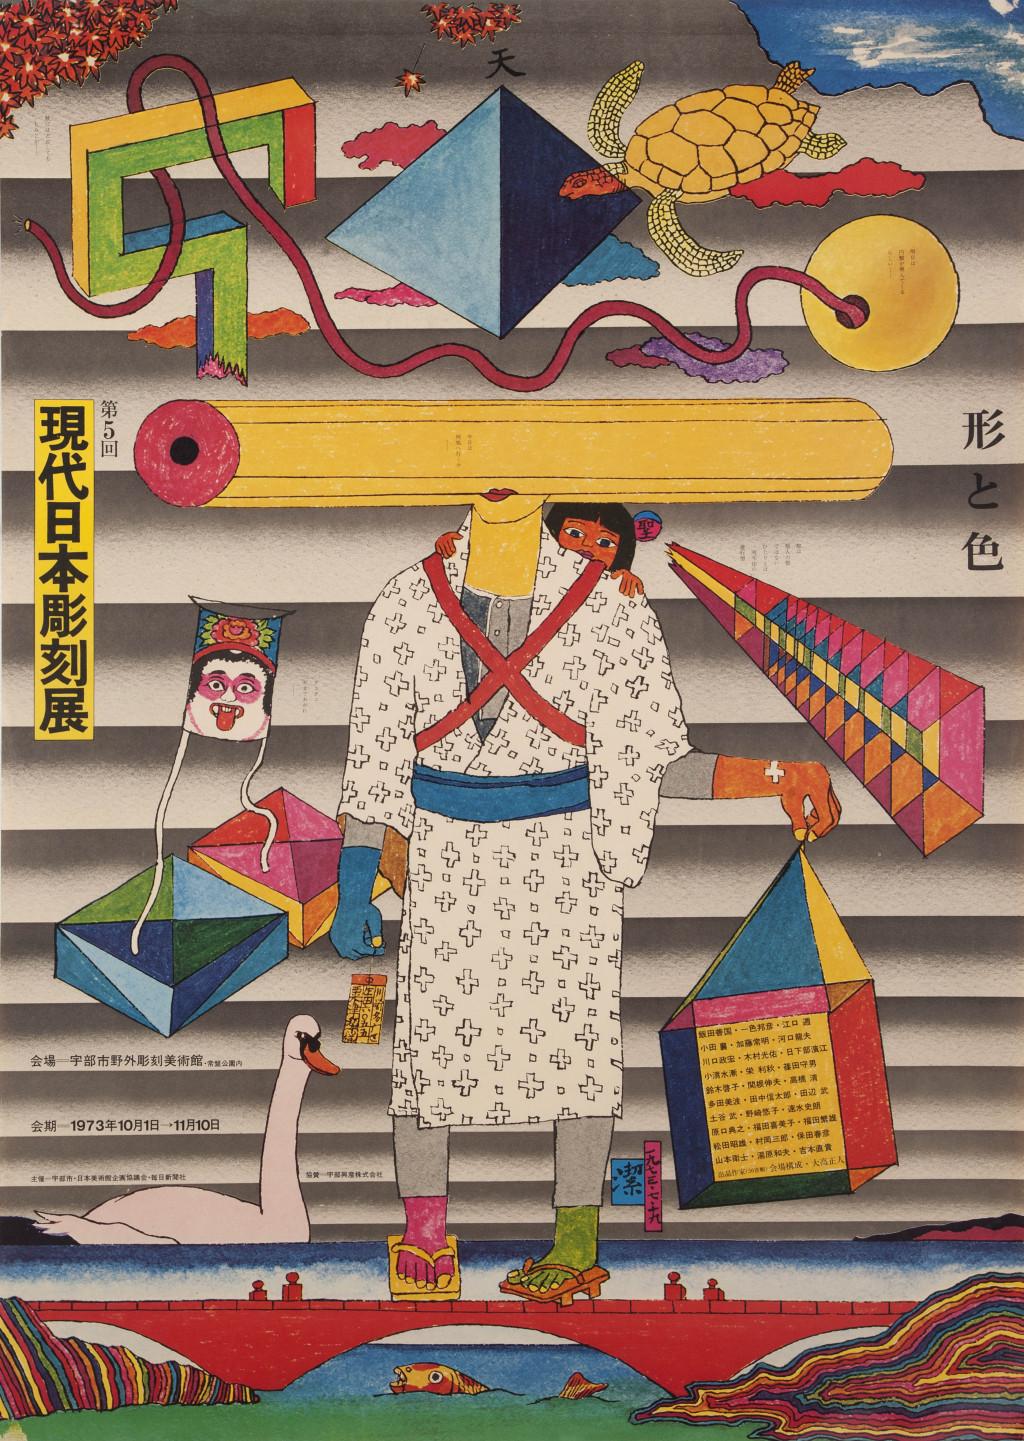 Kiyoshi Awazu, 'The 5th Exhibition of Contemporary Japanese Sculpture', 1973. Collection Stedelijk Museum Amsterdam